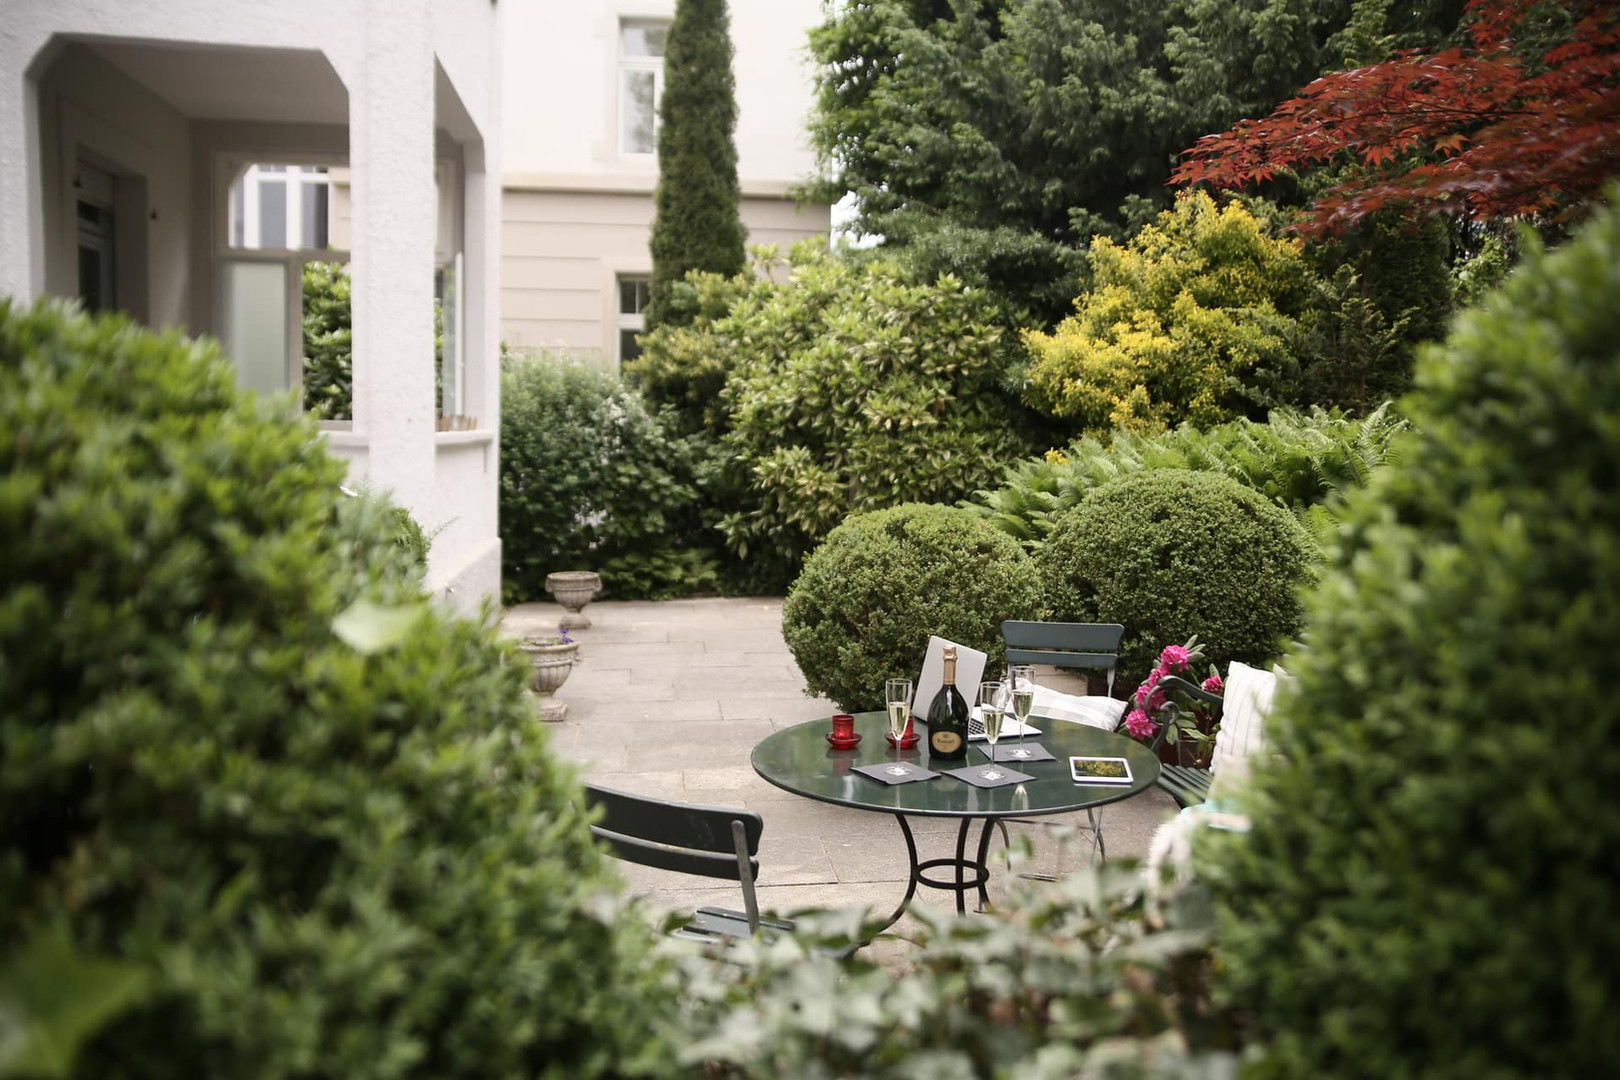 GardenB-resizeimage.jpg